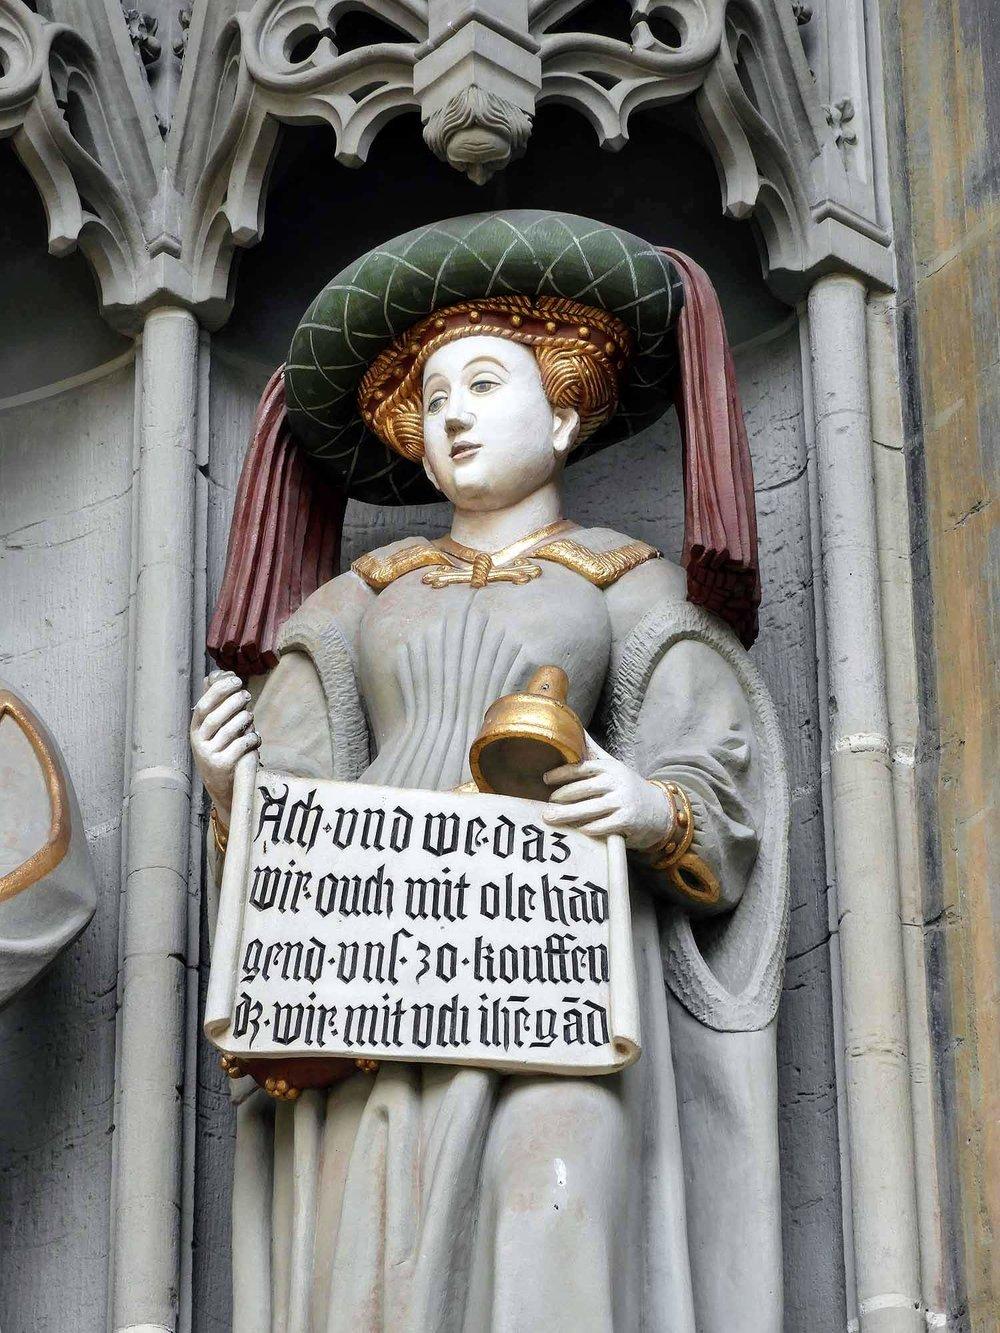 switzerland-bern-frau-woman-statue.jpg